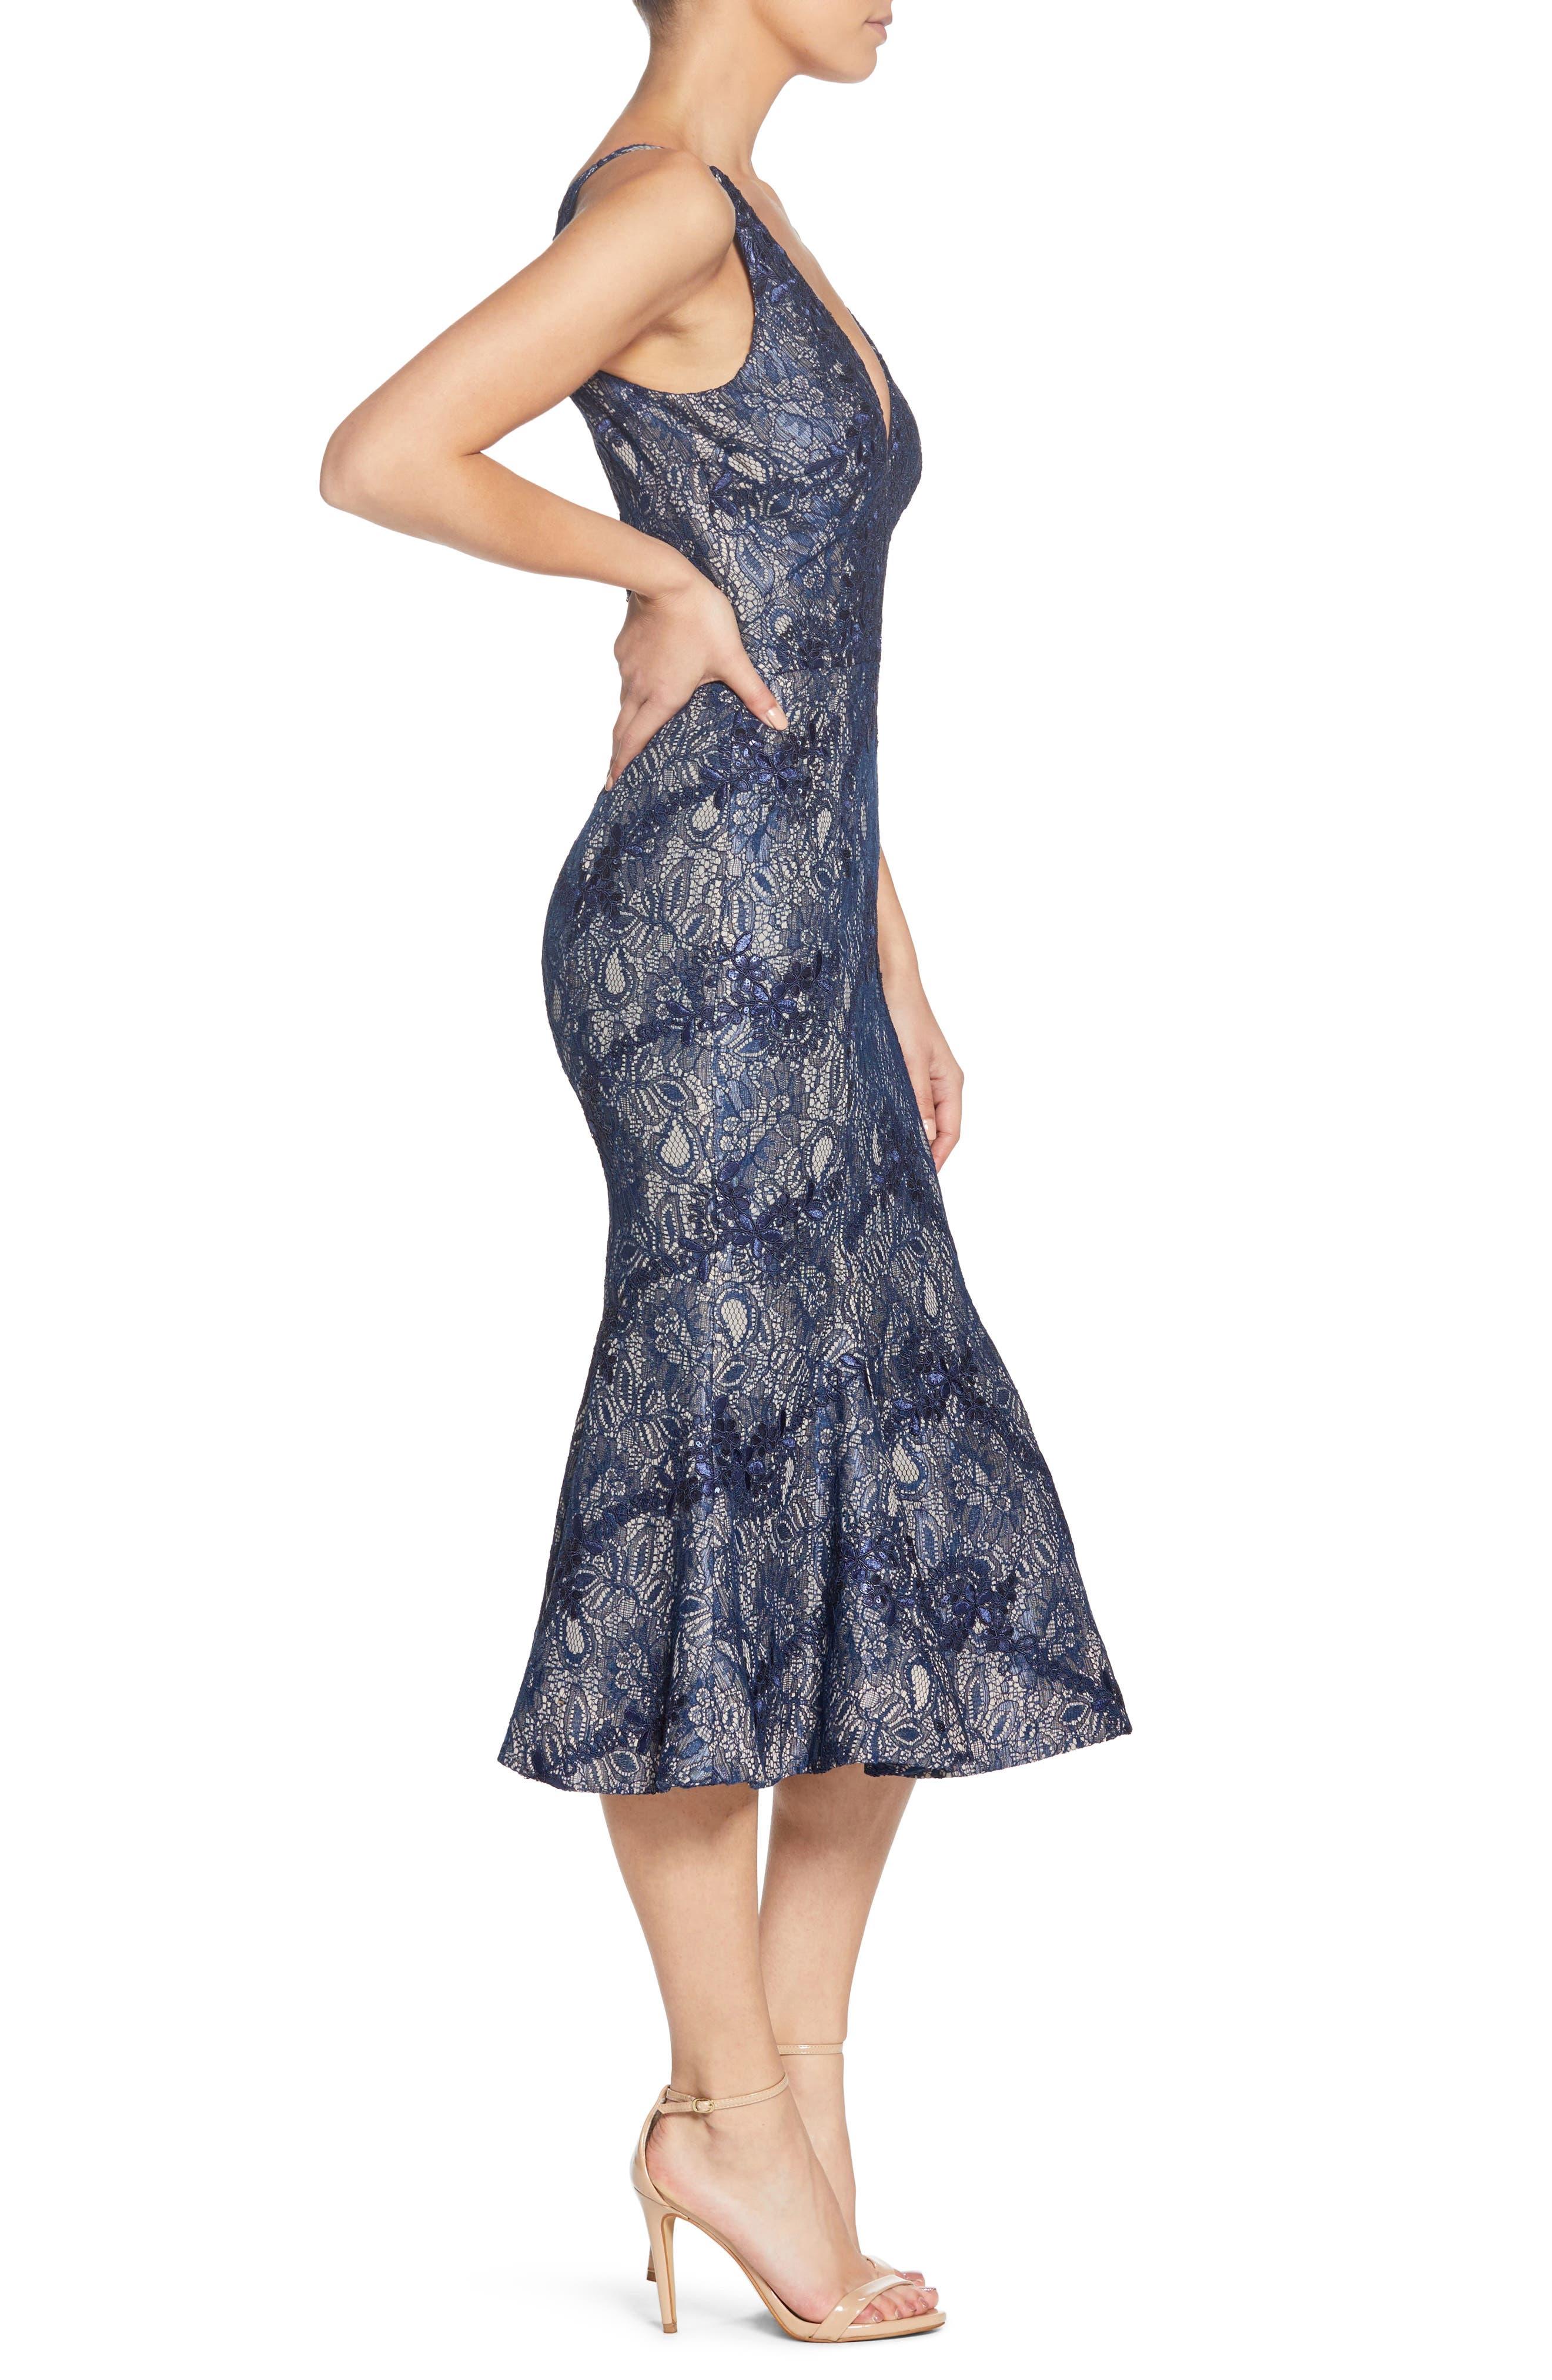 Isabelle Plunge Neck Lace Trumpet Dress,                             Alternate thumbnail 4, color,                             Navy/ Nude